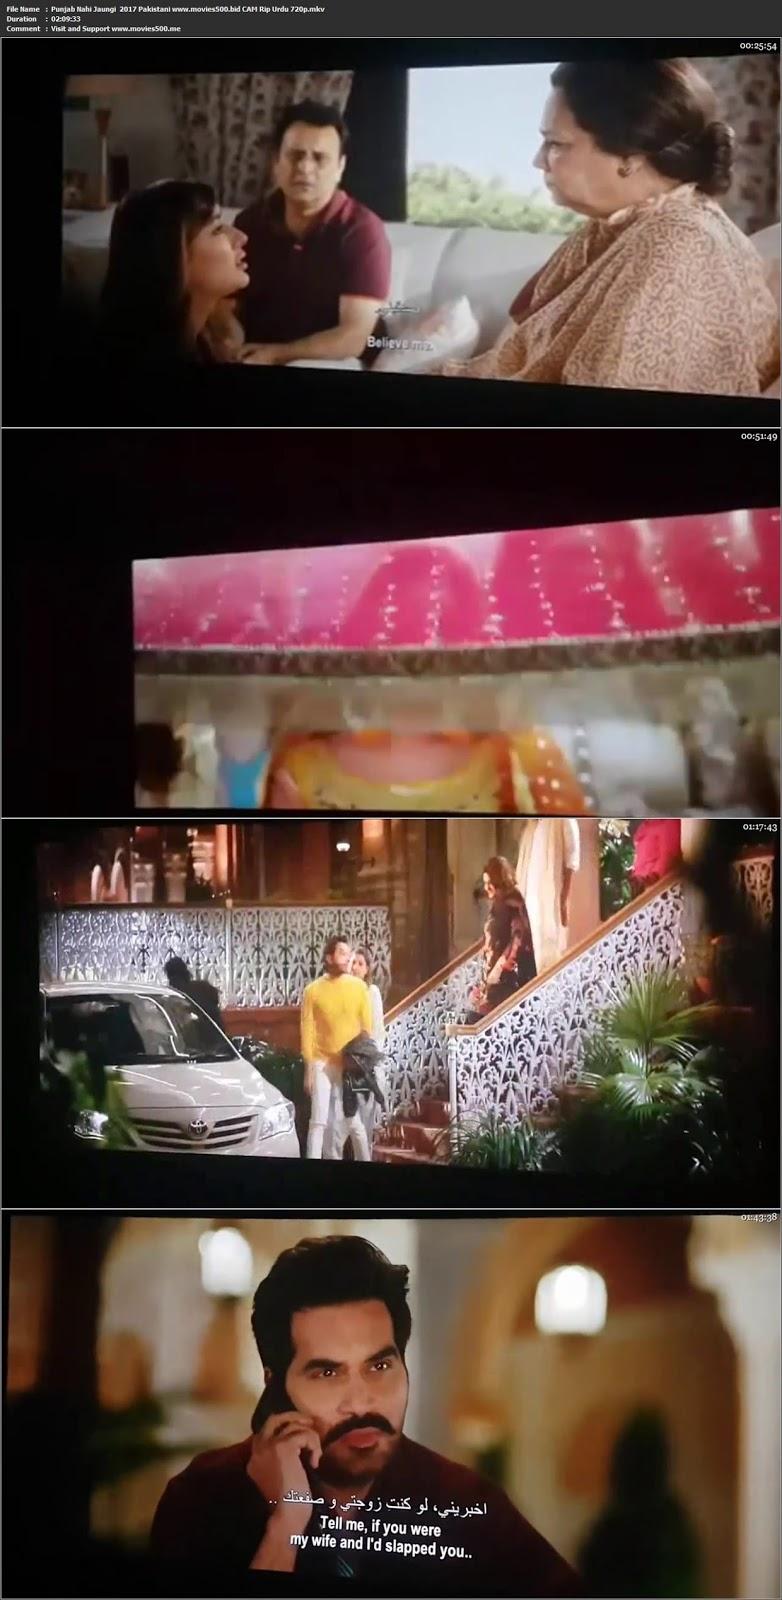 Punjab Nahi Jaungi 2017 Pakistani Full Urdu Movie pDVDRip 720p at doneintimeinc.com